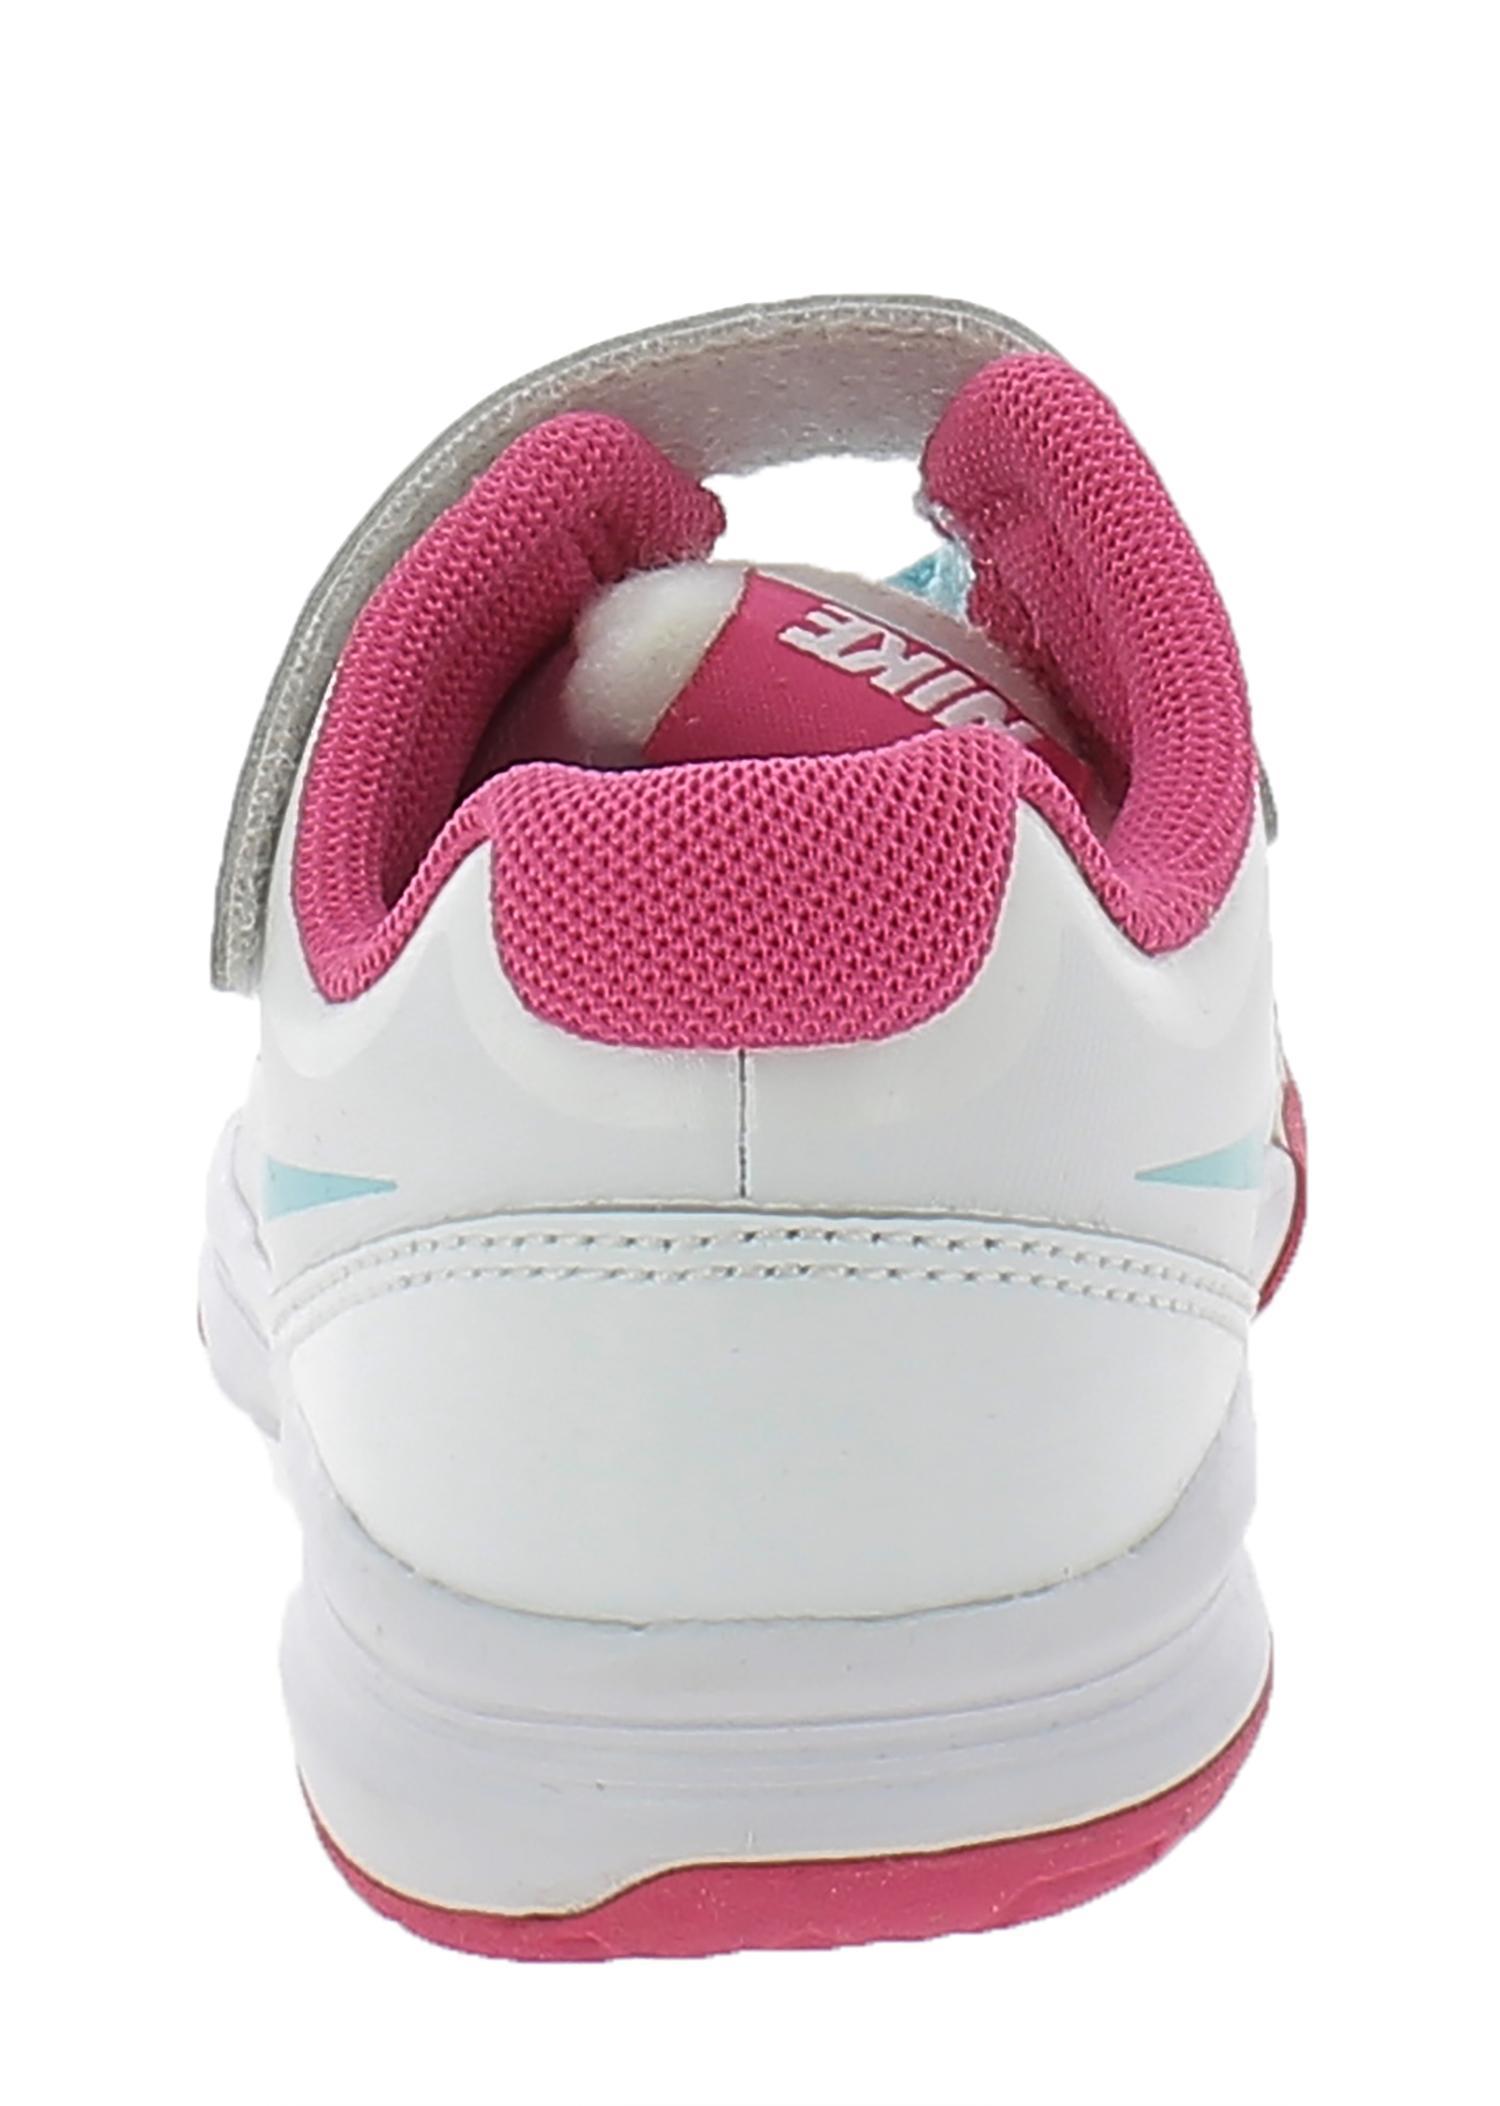 nike nike vapor court psv scarpe sportive bambina bianche pelle strappi 633377